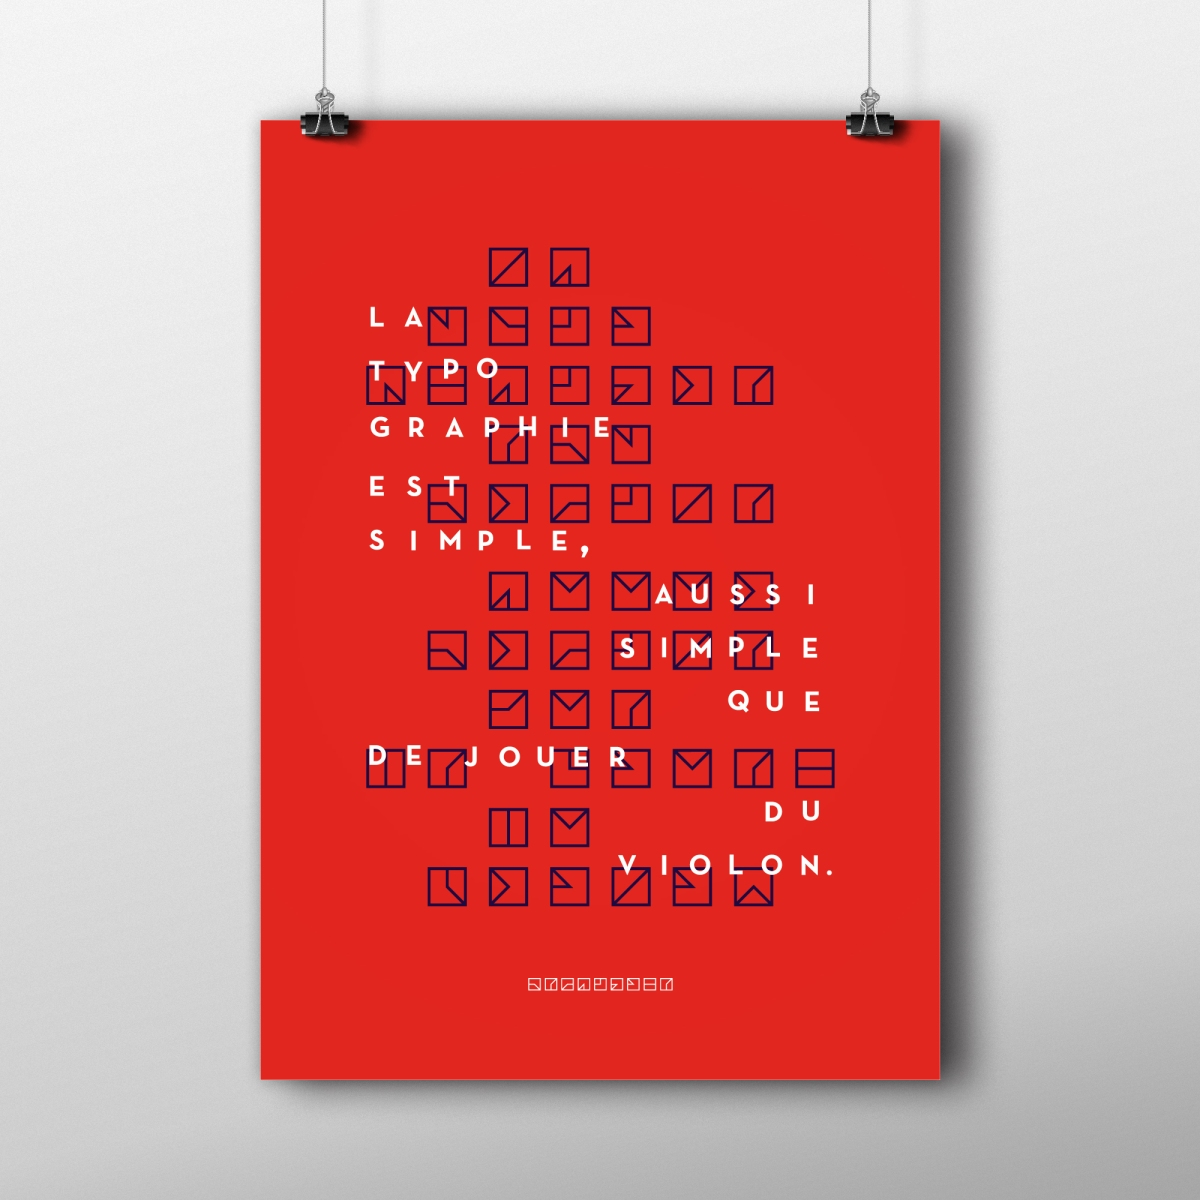 poster_mockup_v3